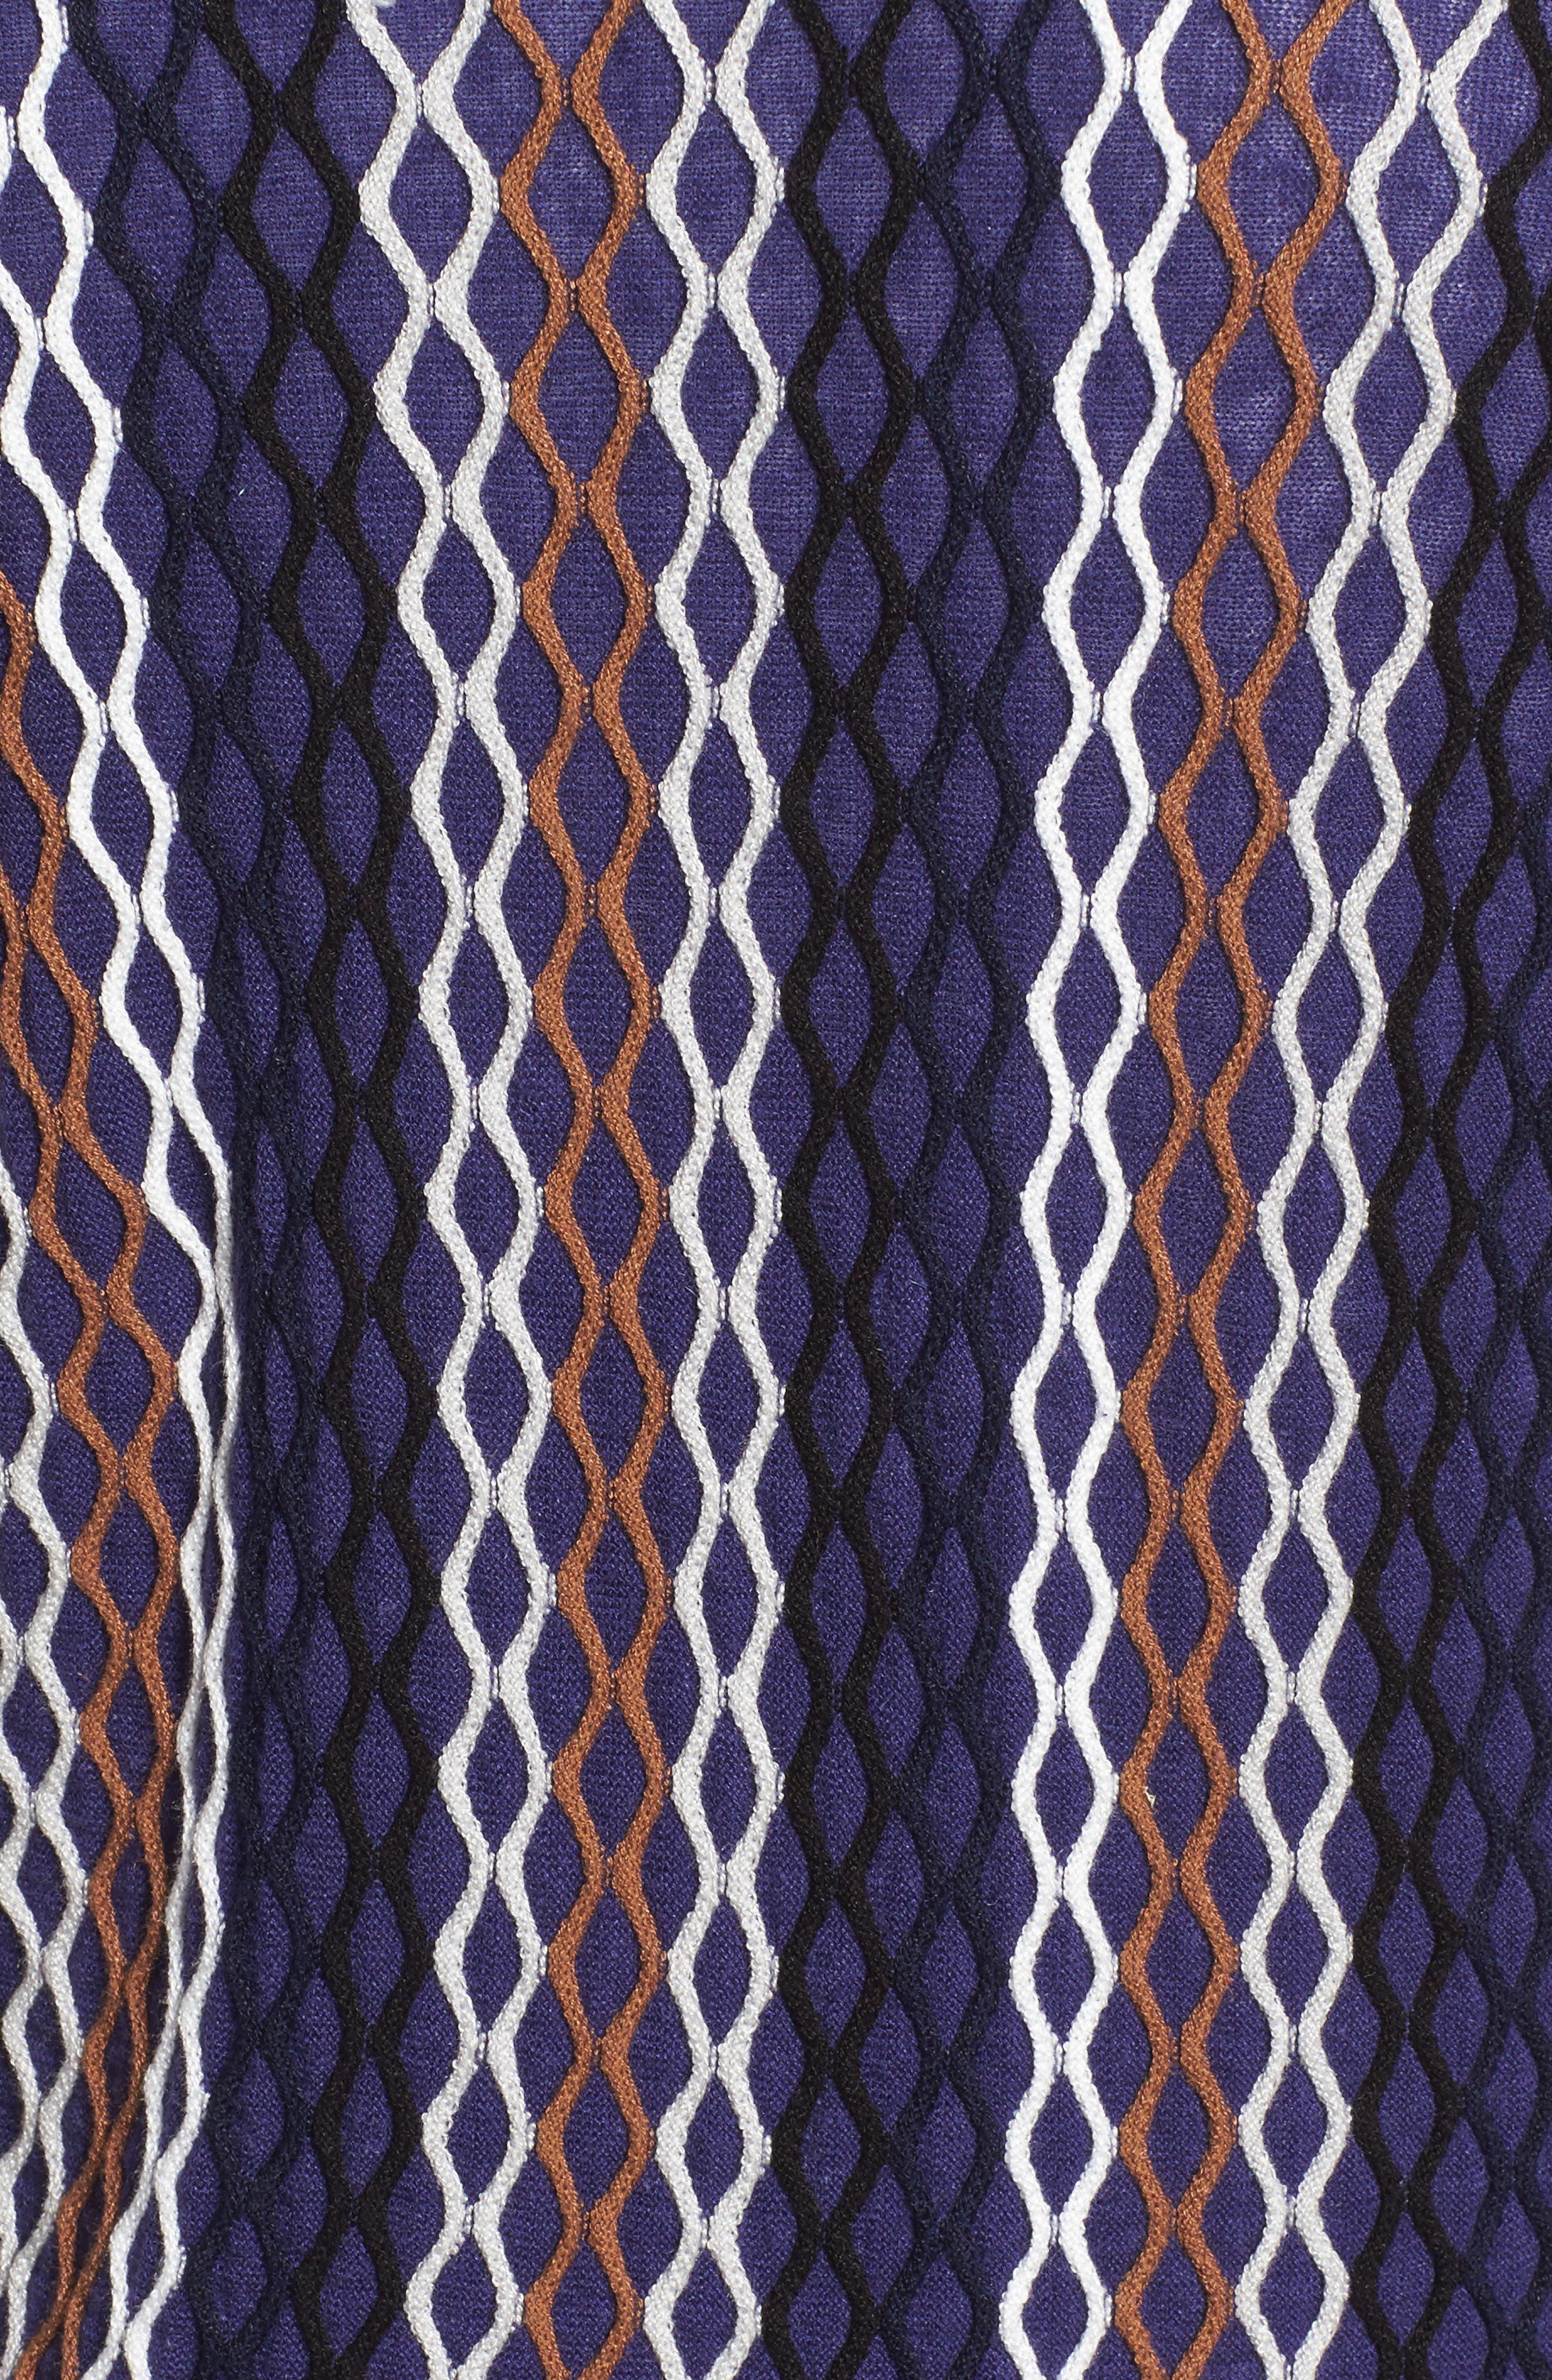 NIC+ ZOE Squiggled Up 4-Way Convertible Cardigan,                             Alternate thumbnail 5, color,                             499